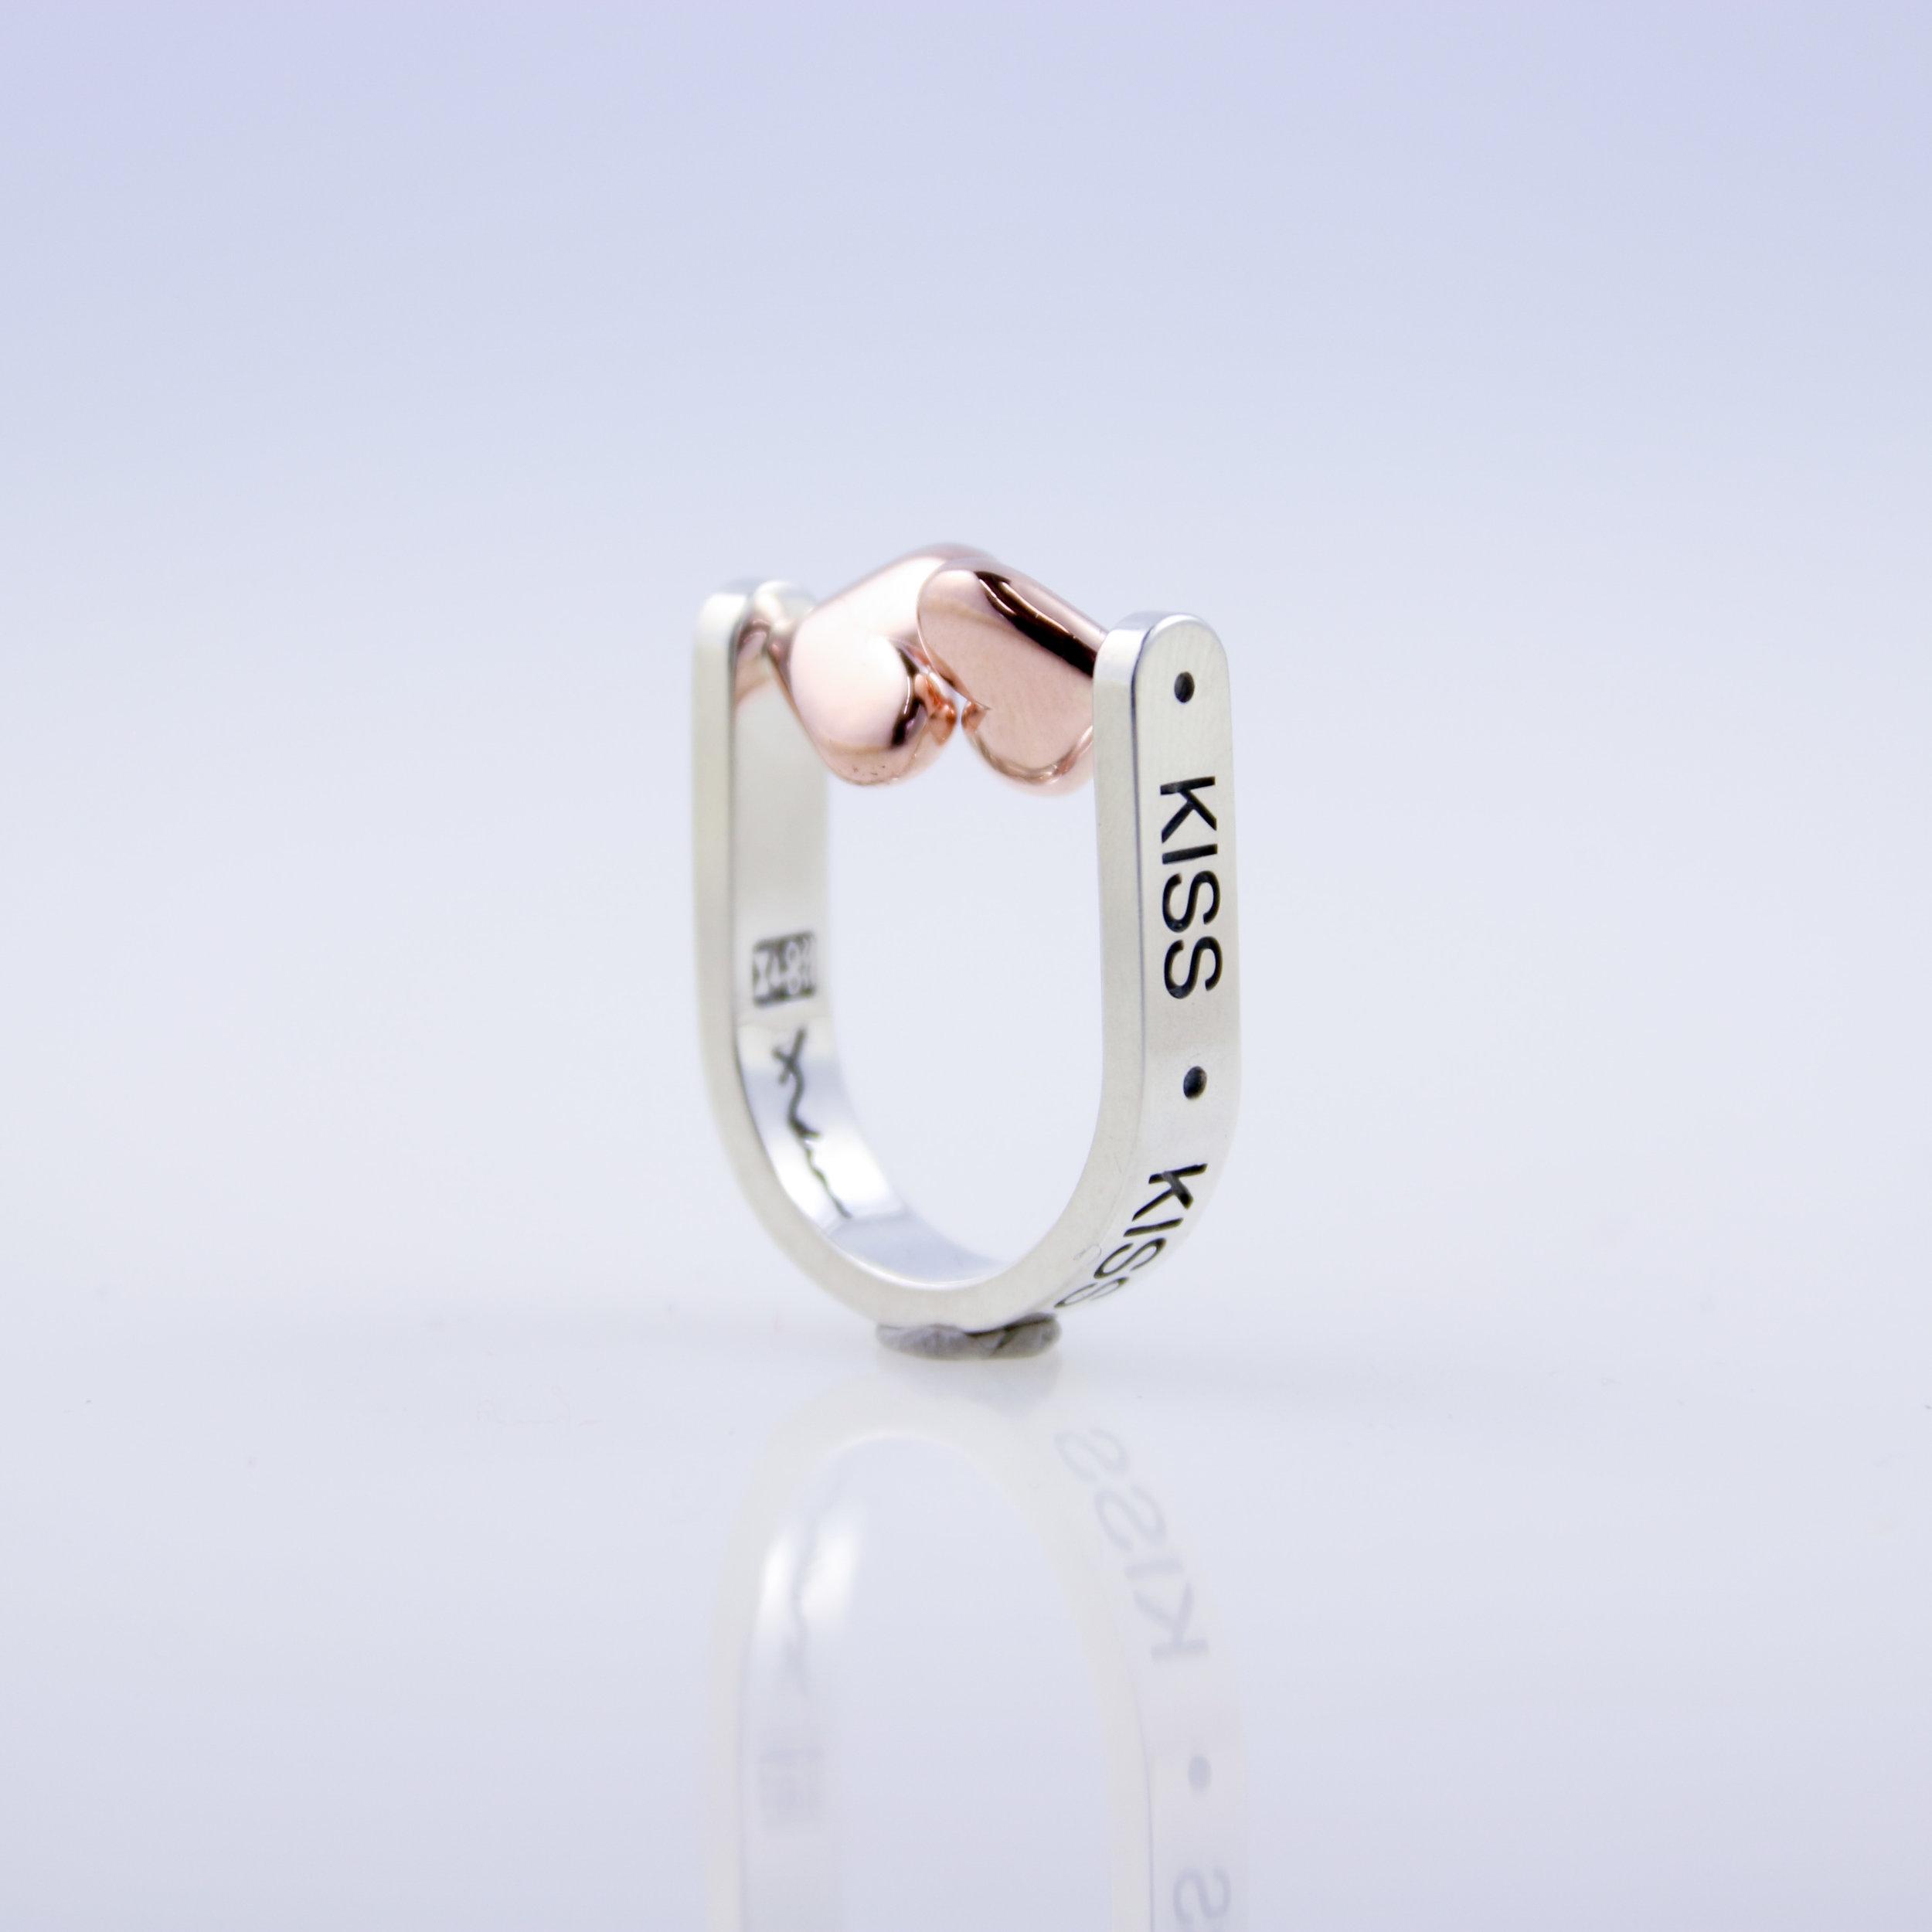 Kiss Ring   white gold, rose gold